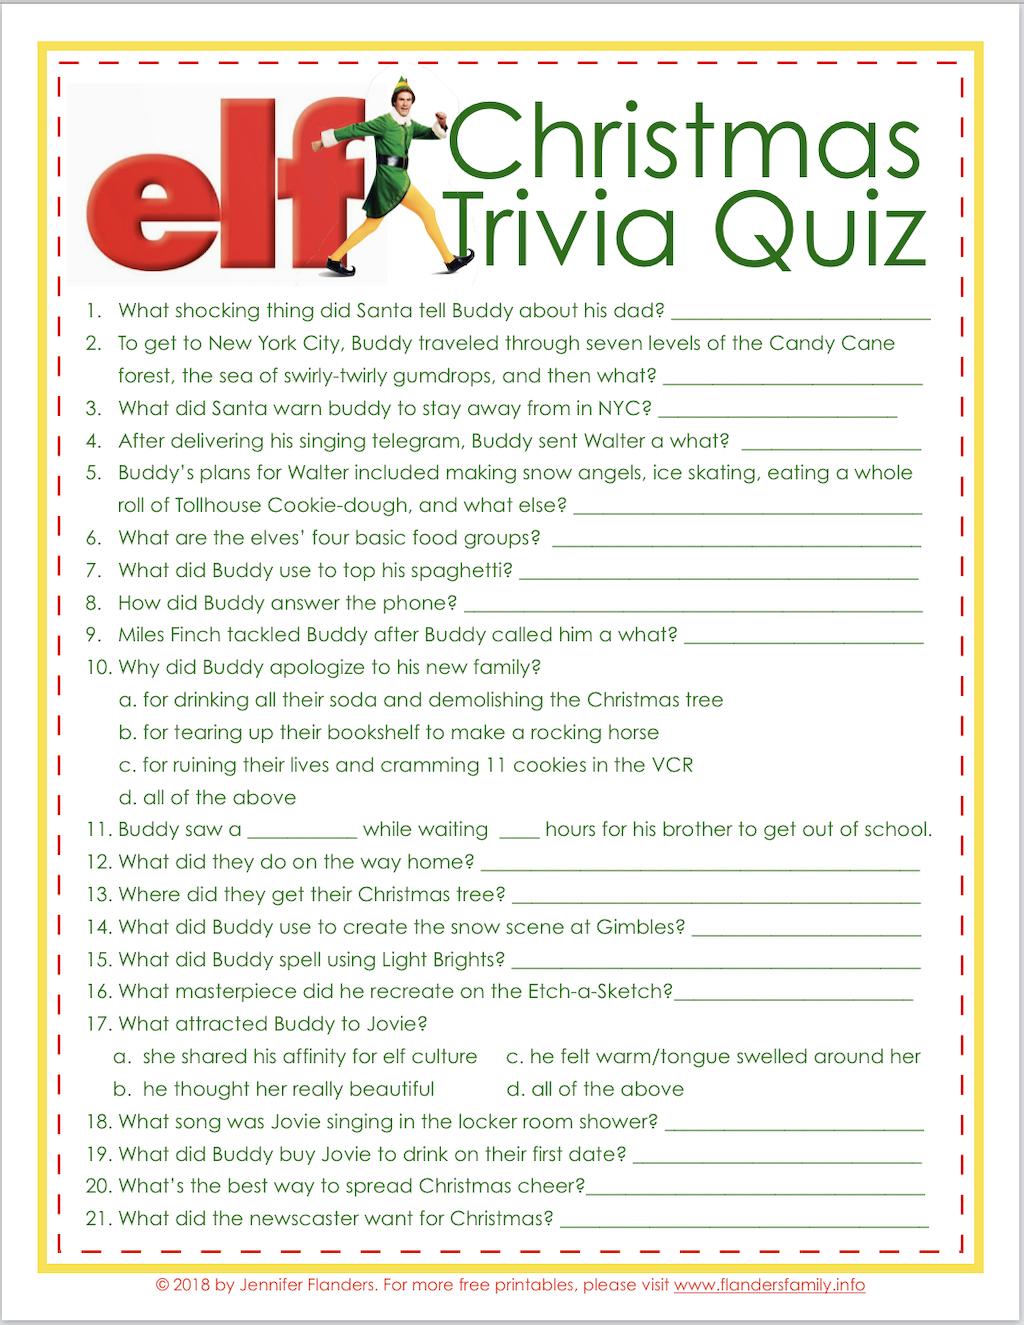 Elf Trivia Christmas Quiz (Free Printable) - Flanders Family